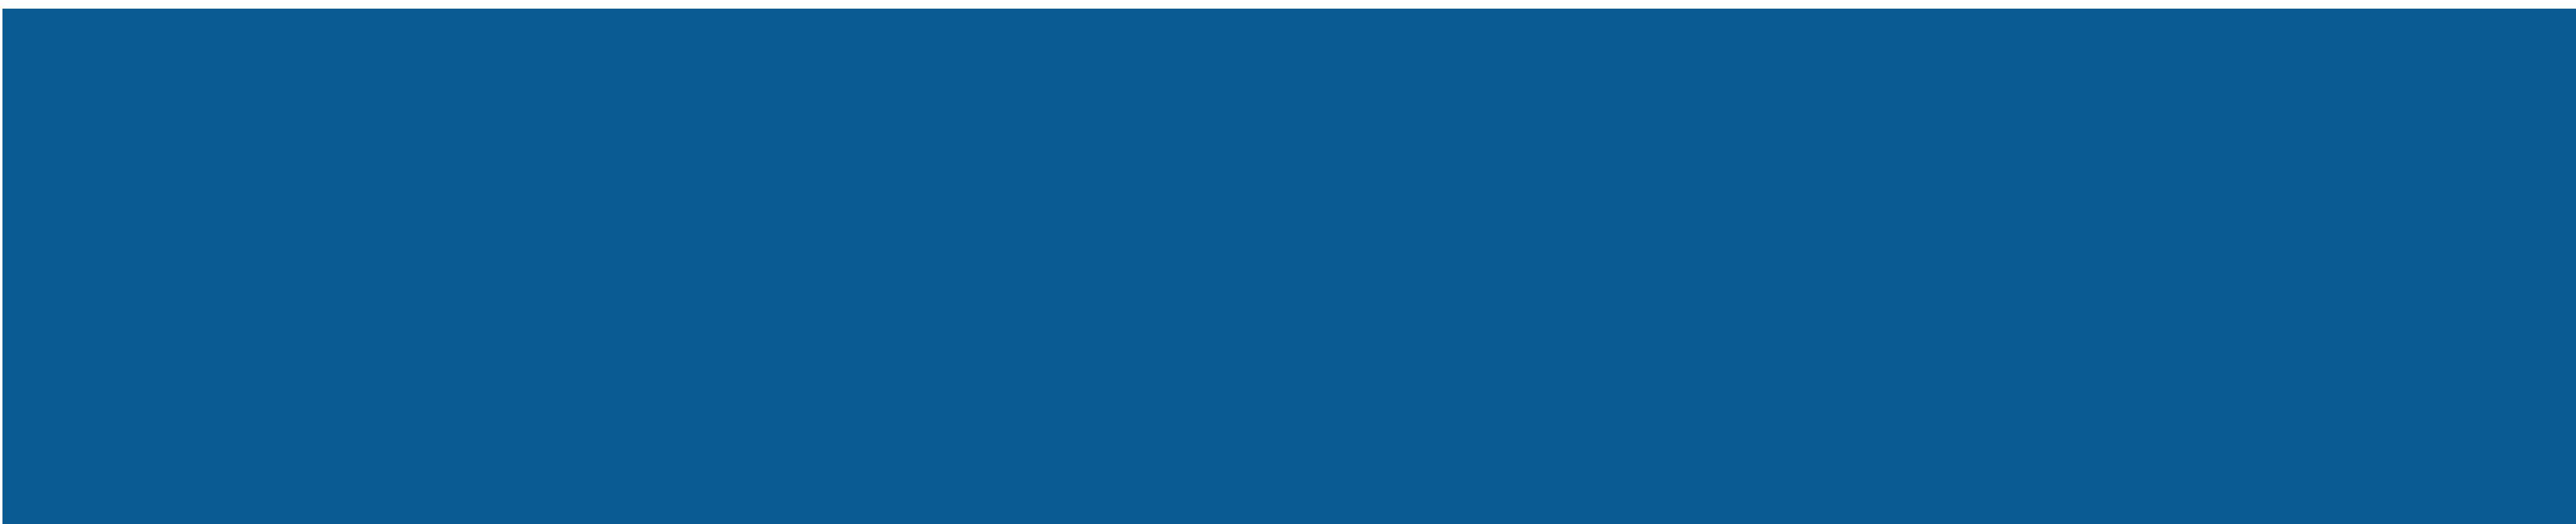 Konnect Insights Logo